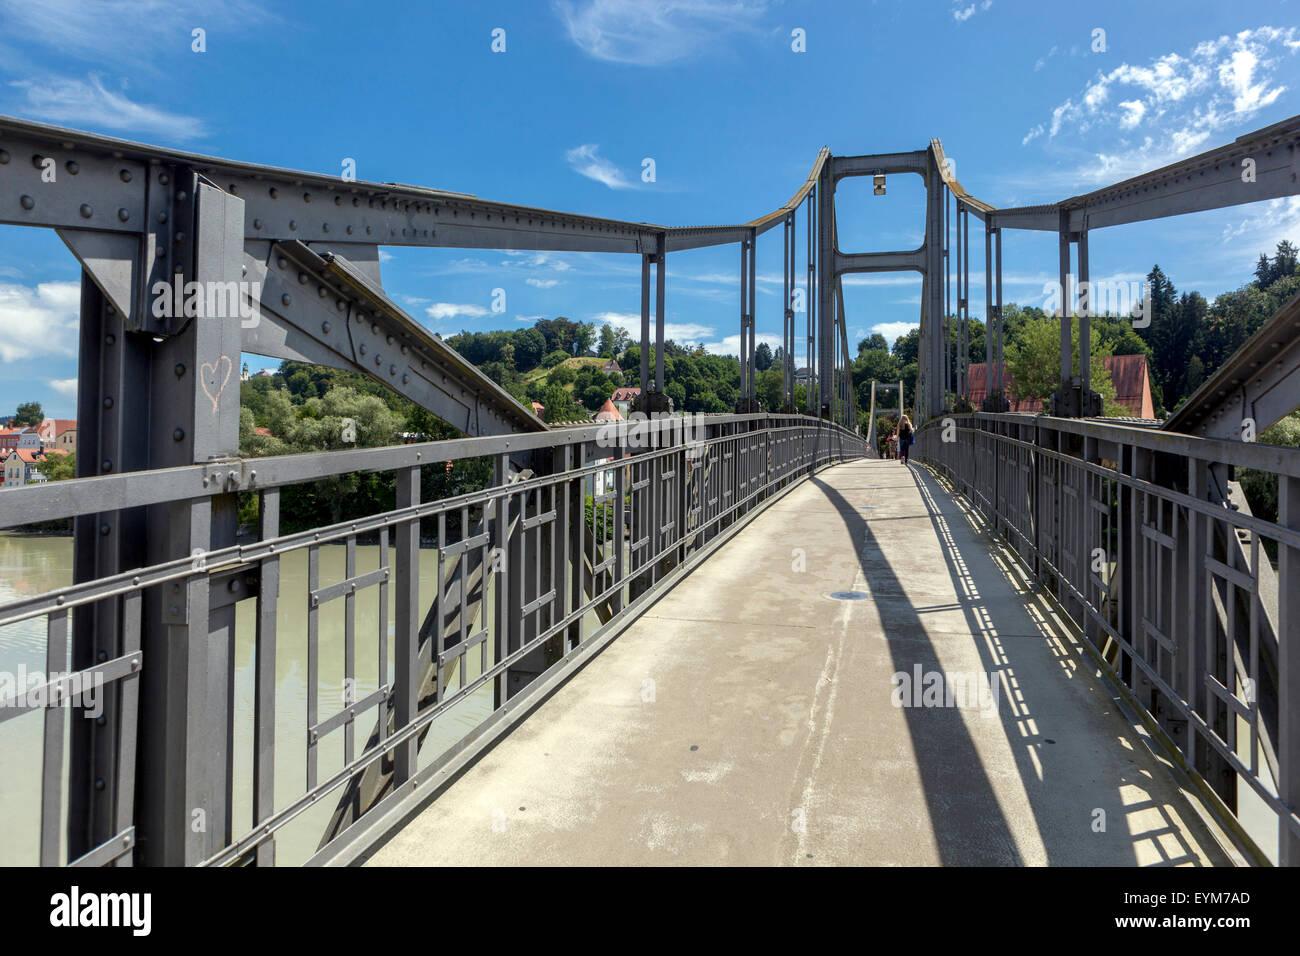 Pedestrian bridge across the river Inn. Passau, Lower Bavaria, Germany - Stock Image